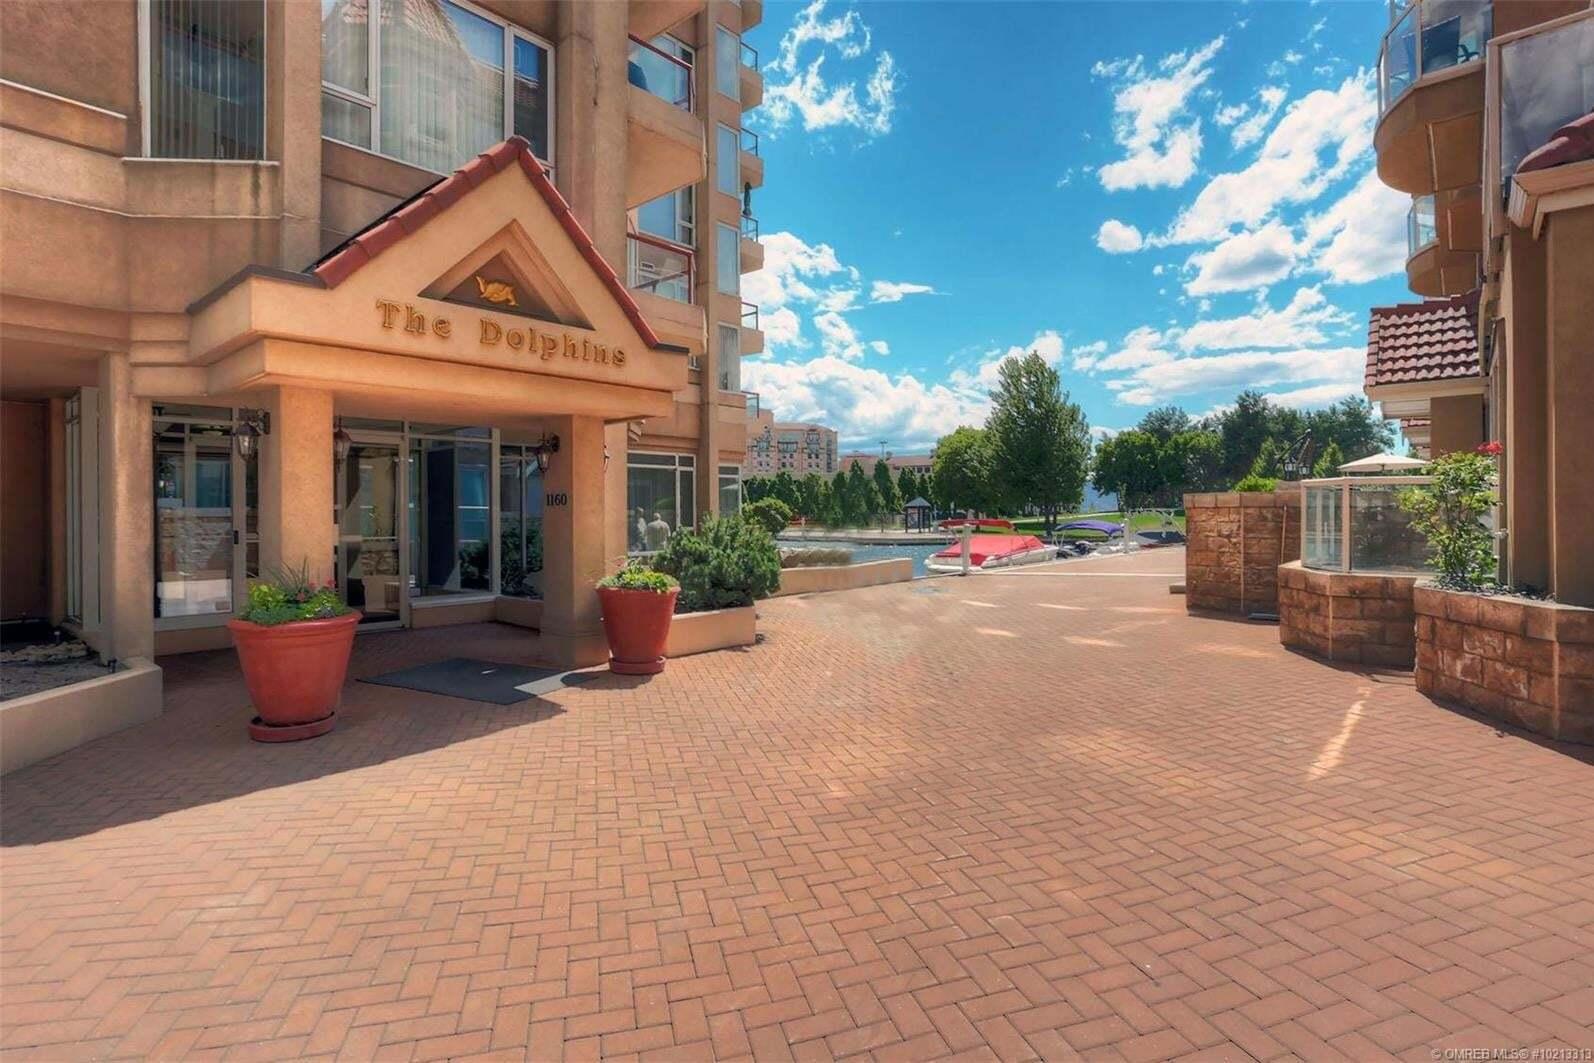 Condo for sale at 1160 Sunset Dr Kelowna British Columbia - MLS: 10213313